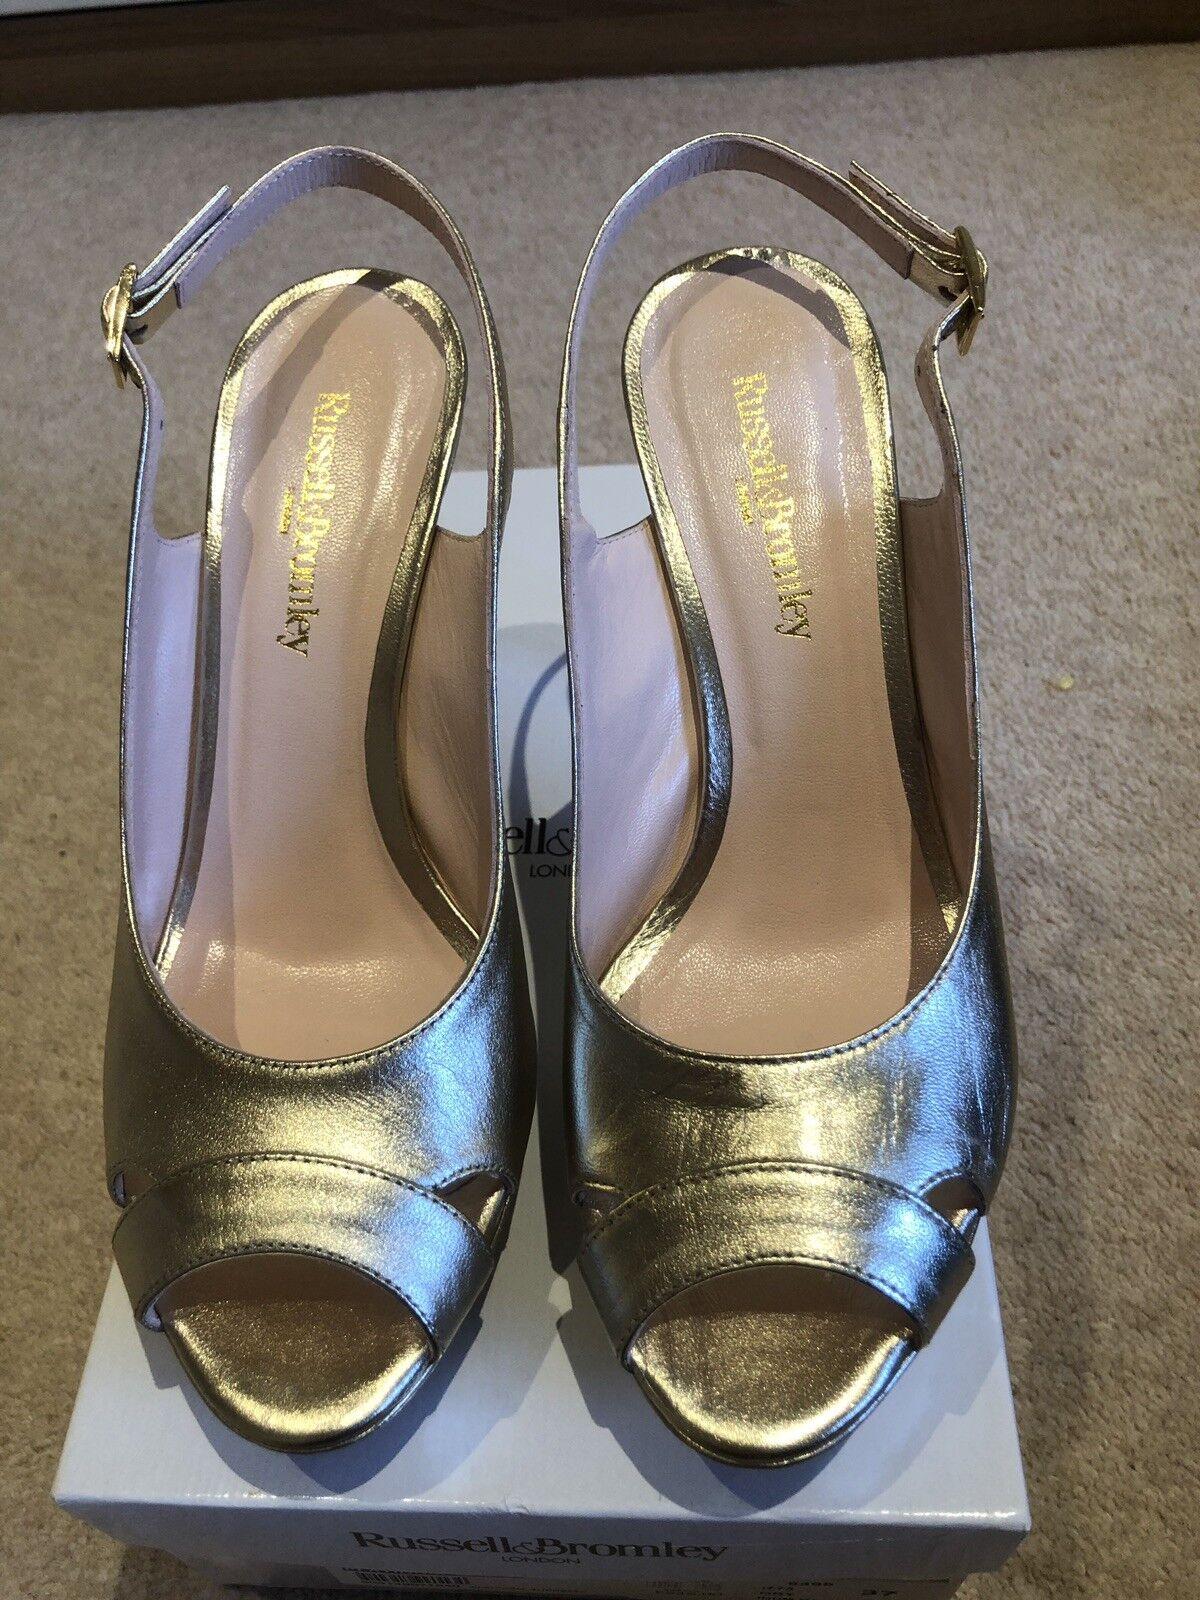 Russell Bromley sling back Chaussures Sandales Taille 37 Élégant Nouveau